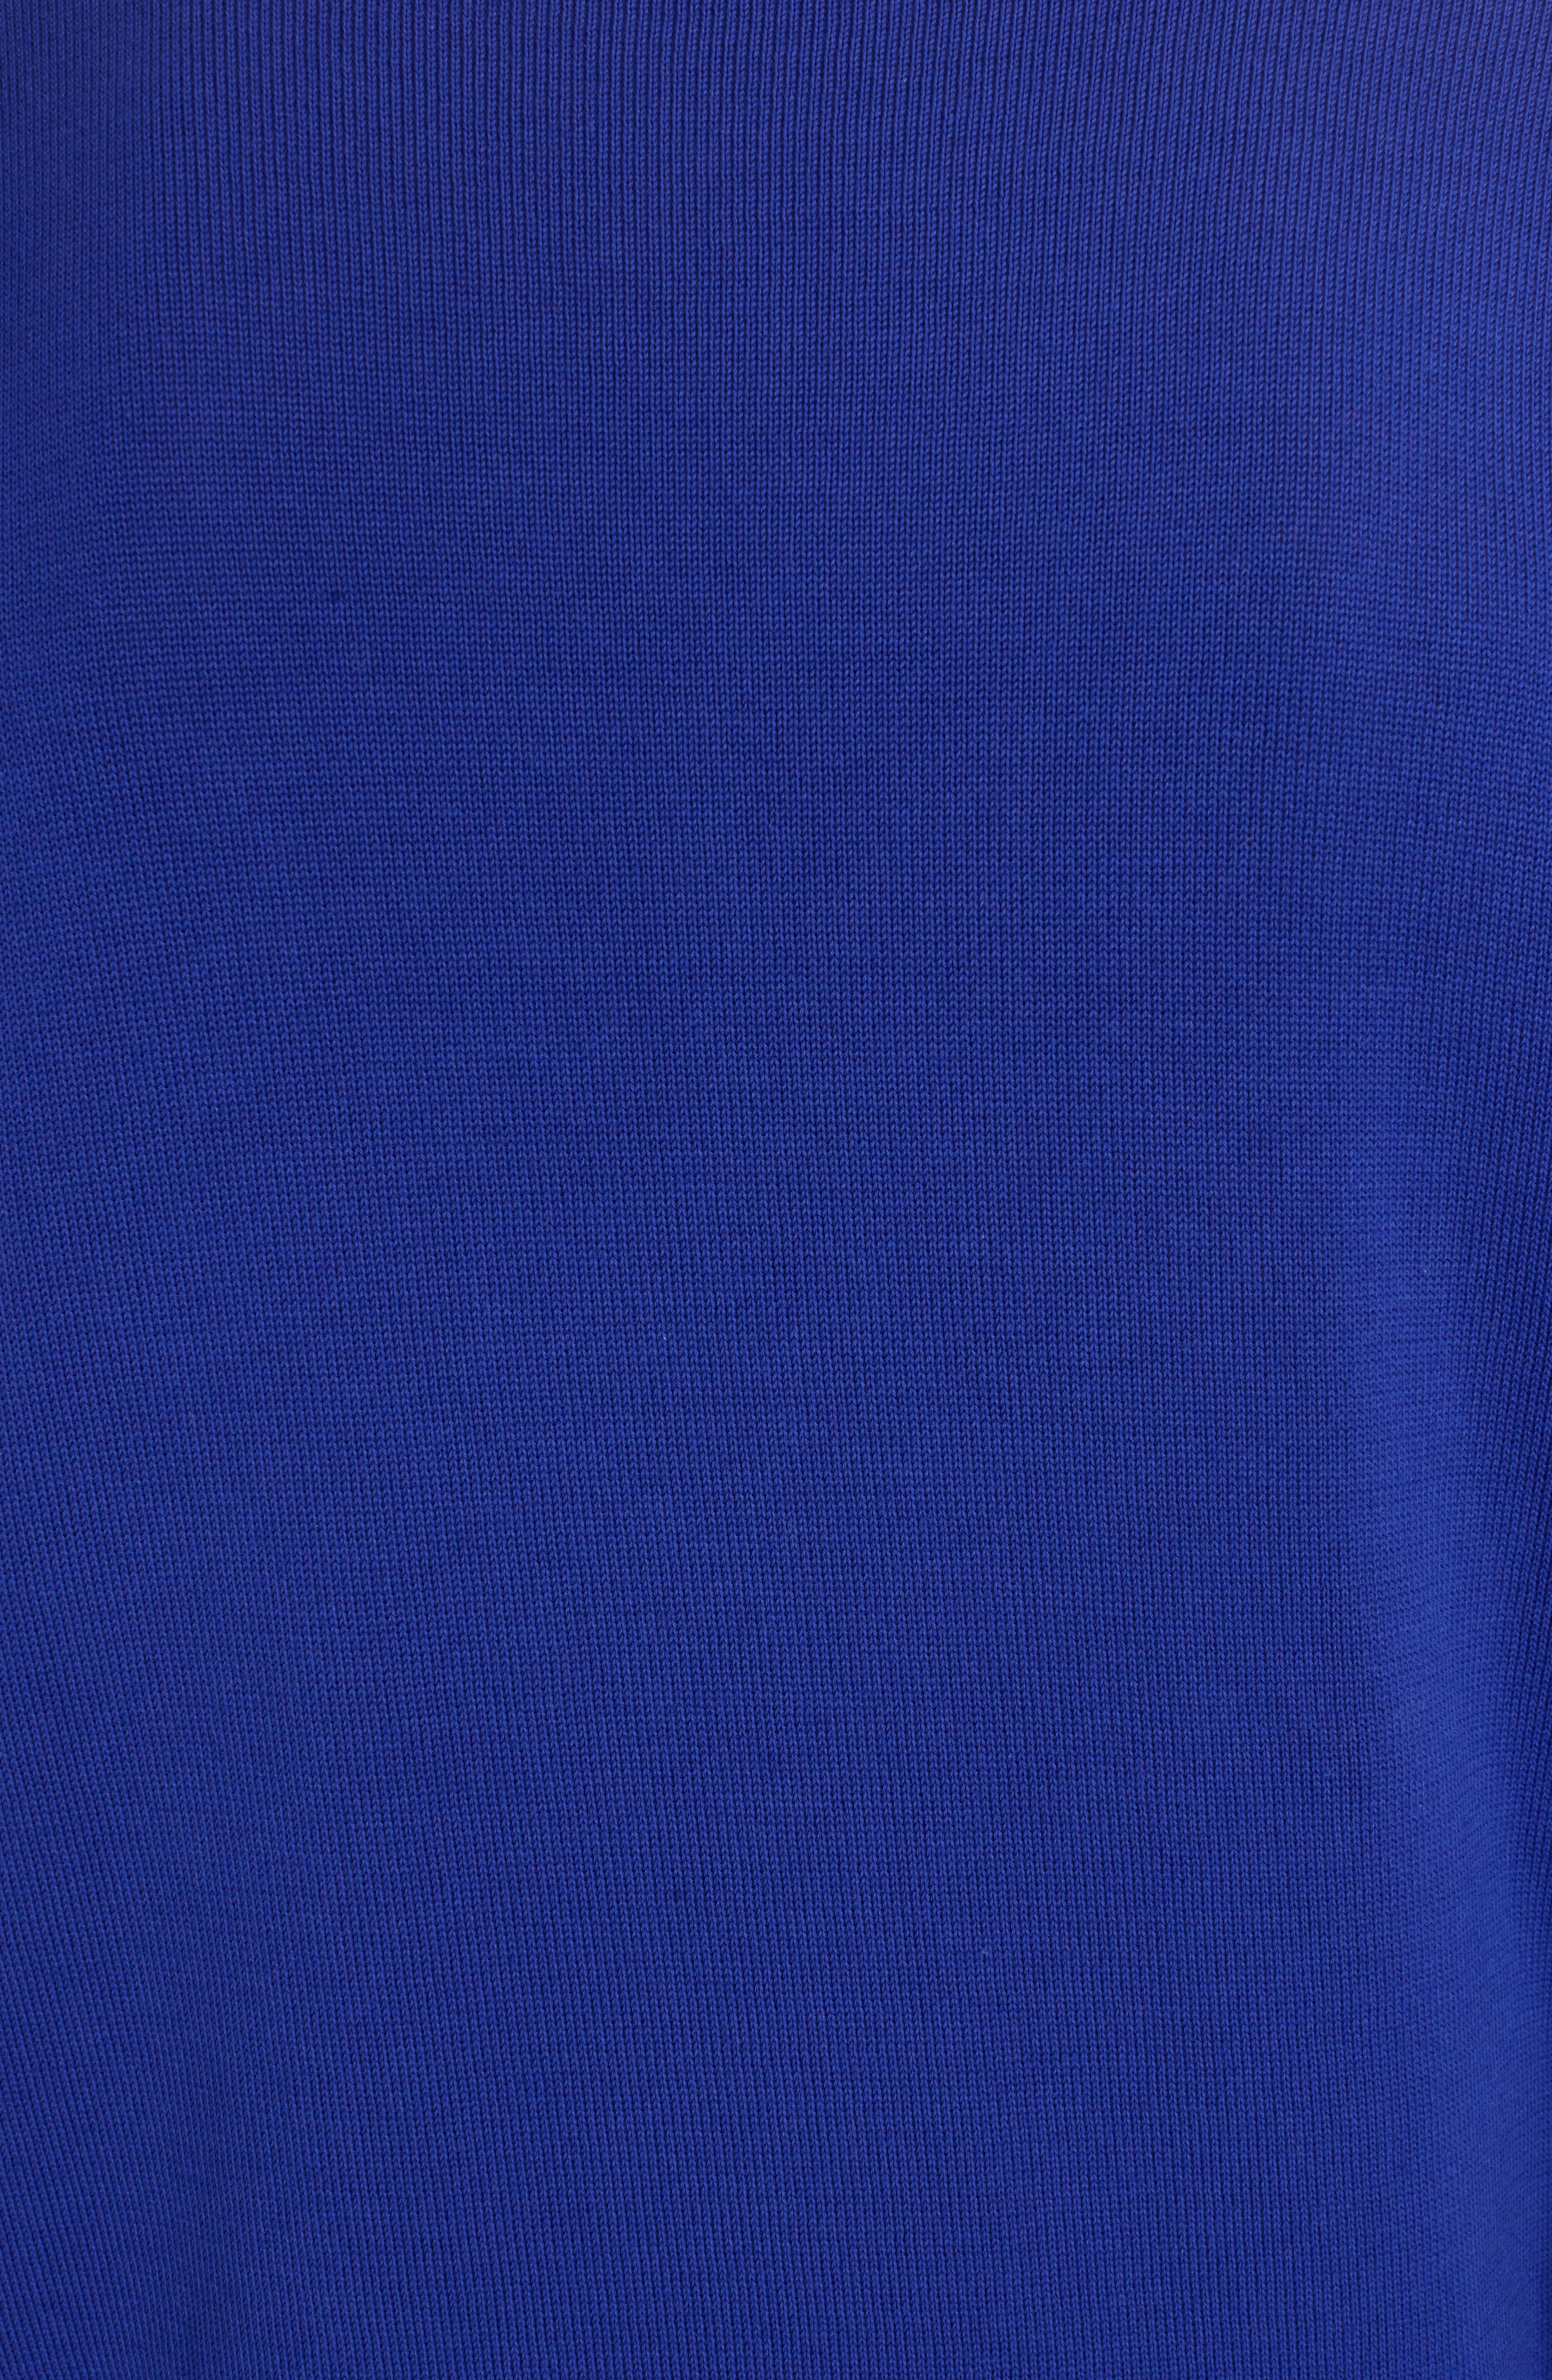 Logo Stripe Sweater,                             Alternate thumbnail 5, color,                             French Blue